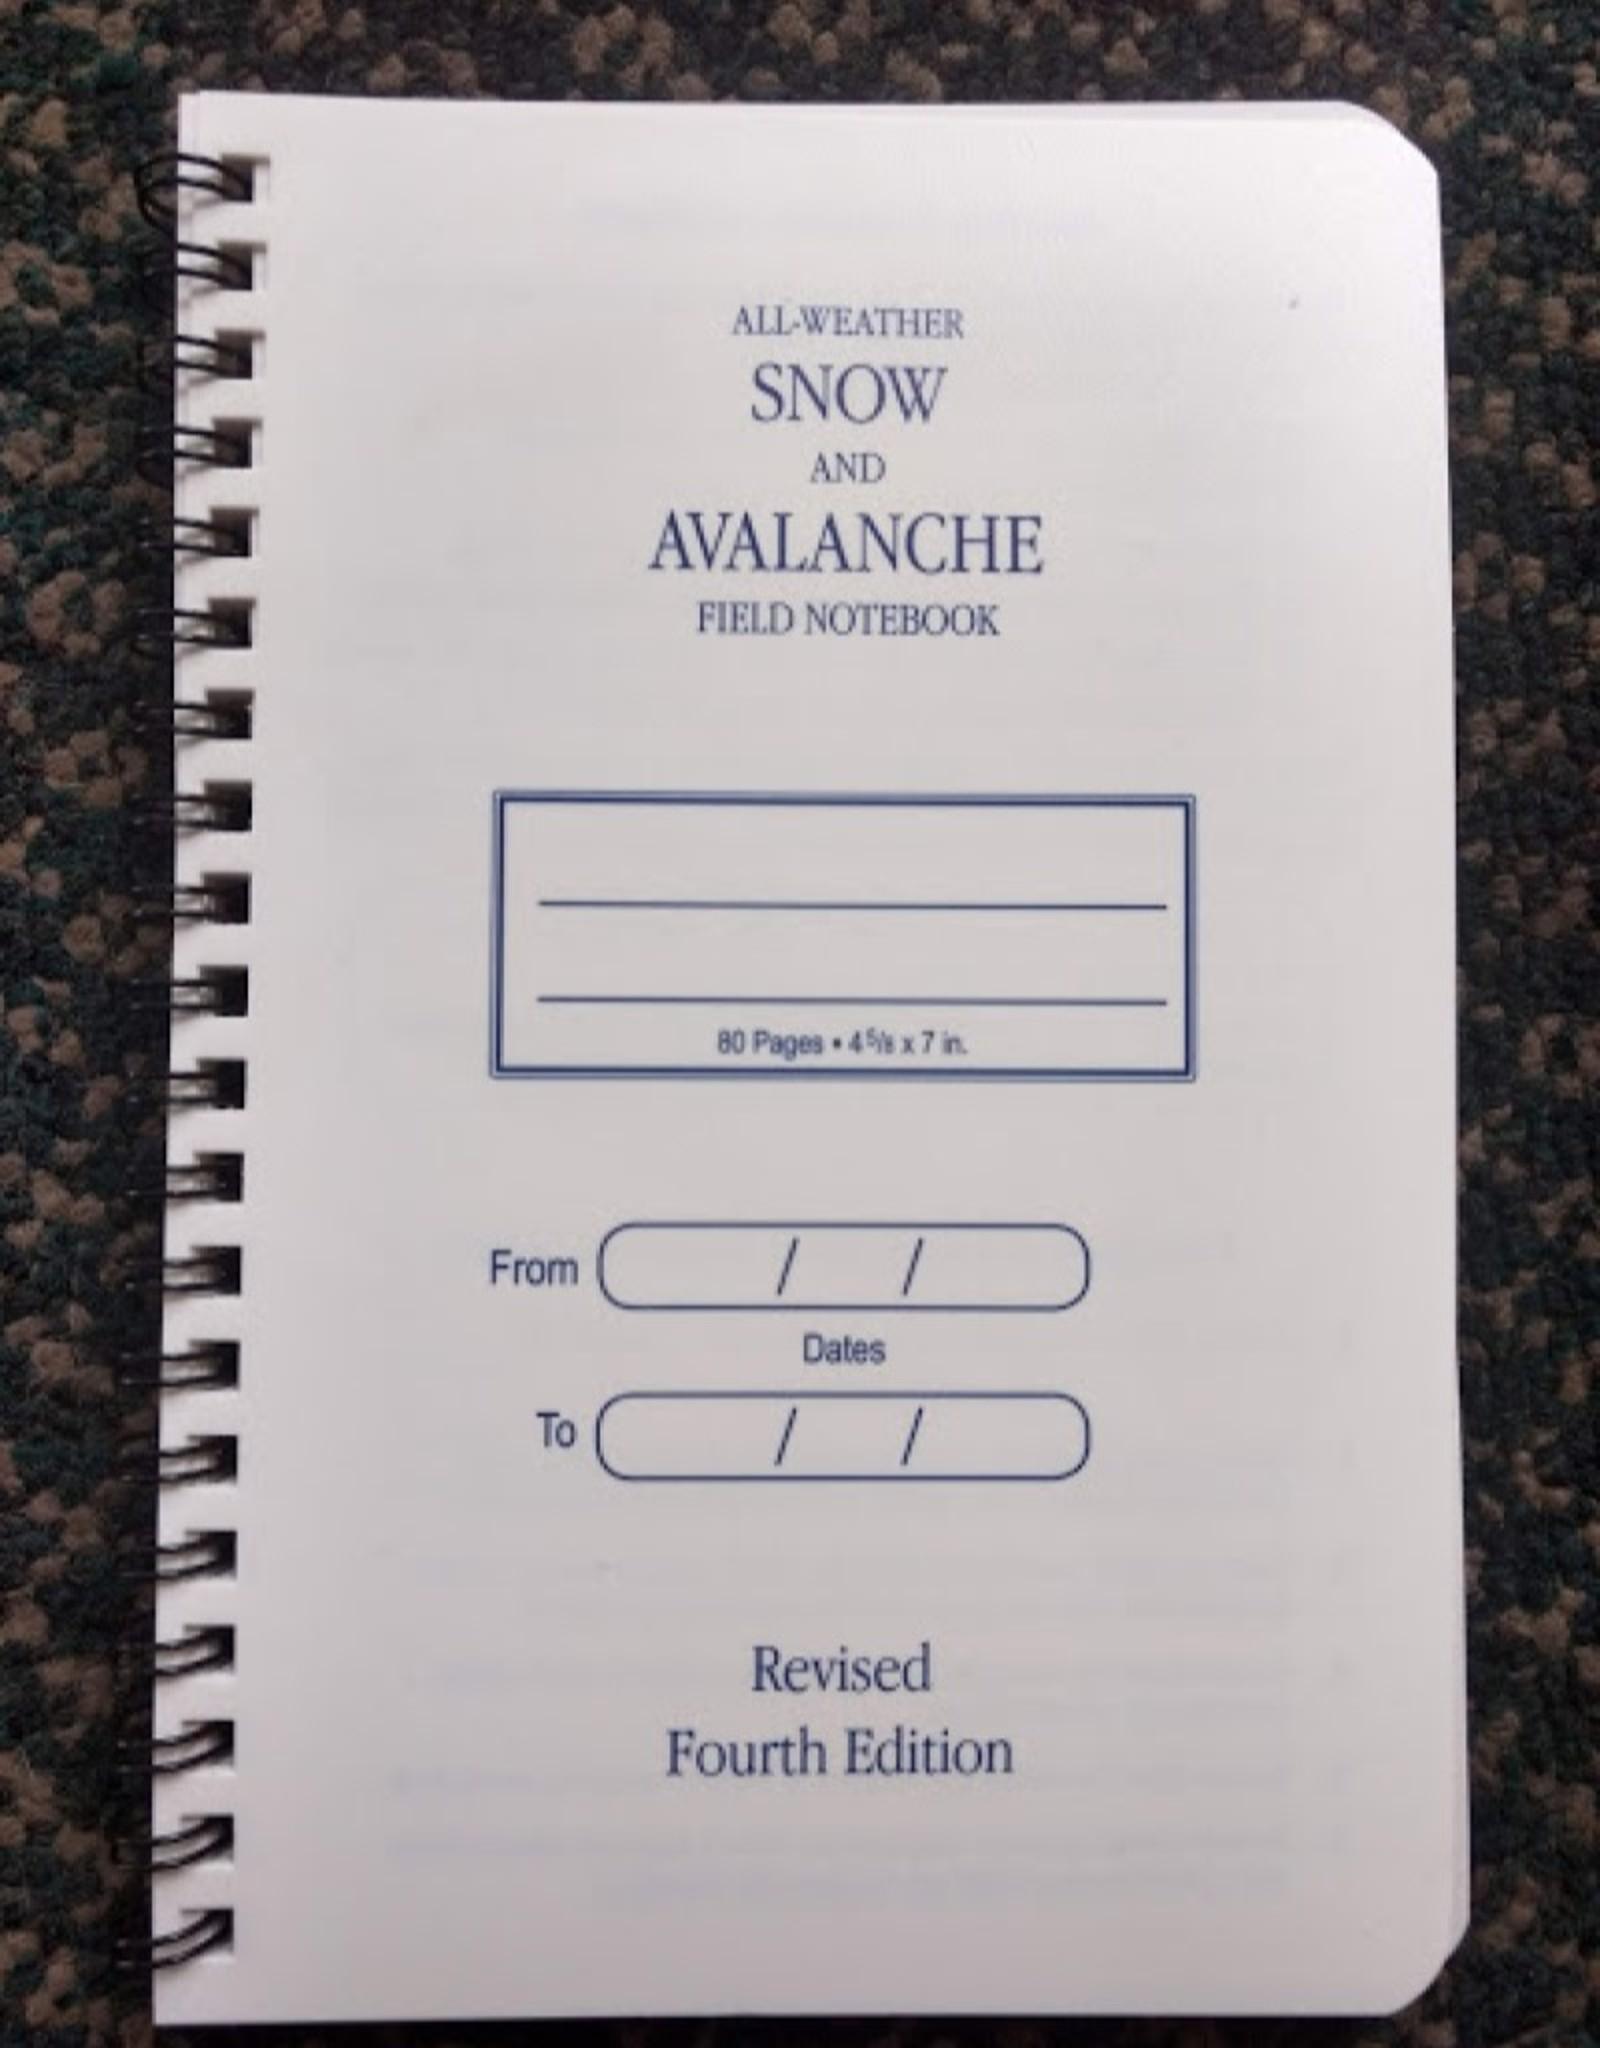 SNOW PIT TECH, AVAL/ SNOW PRO BOOK